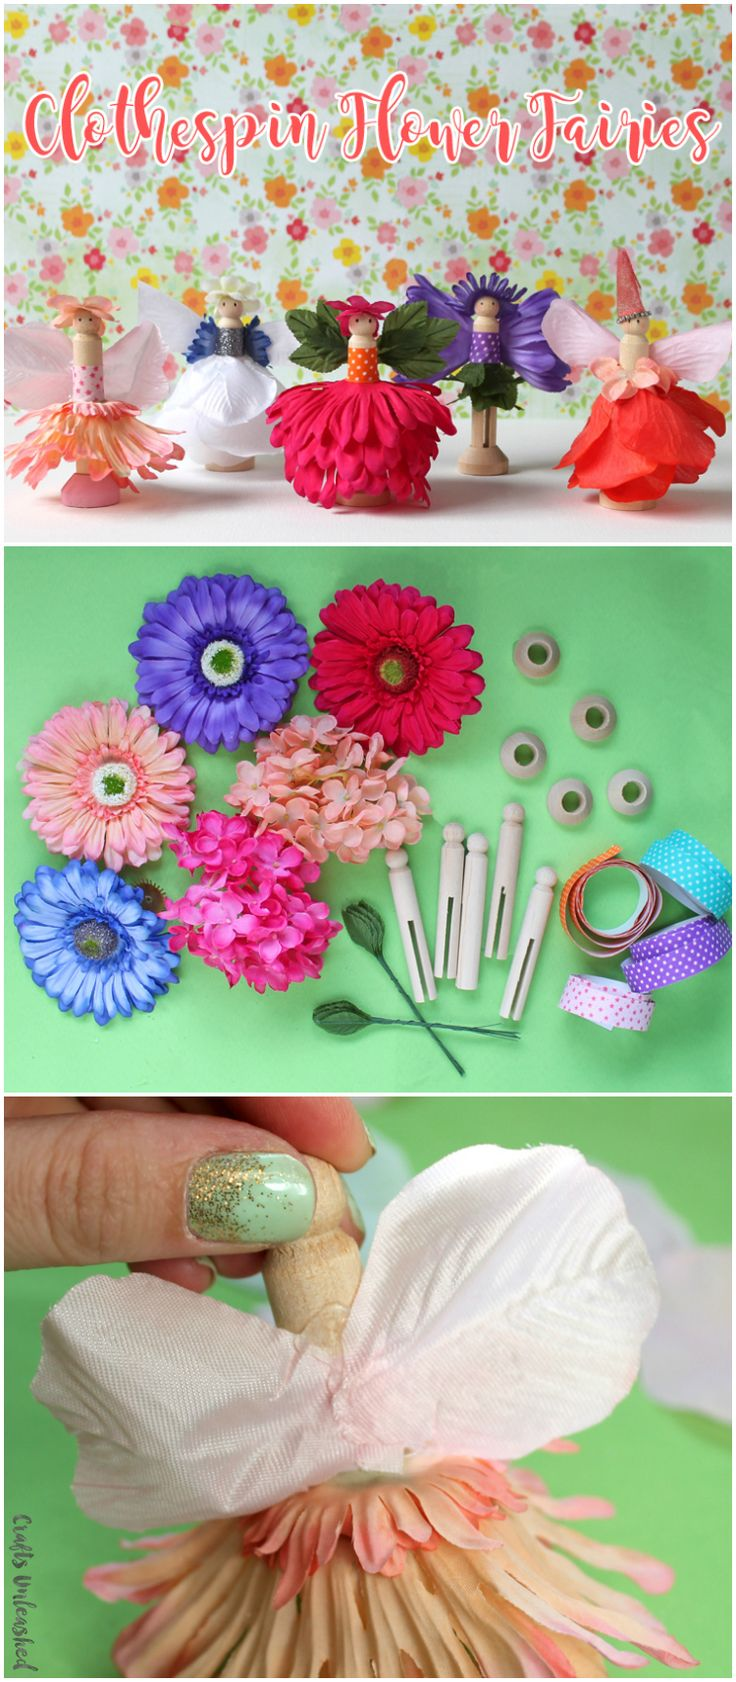 Diy Fairy Flower Clothespins Crafts Unleashed Craft 400 x 300